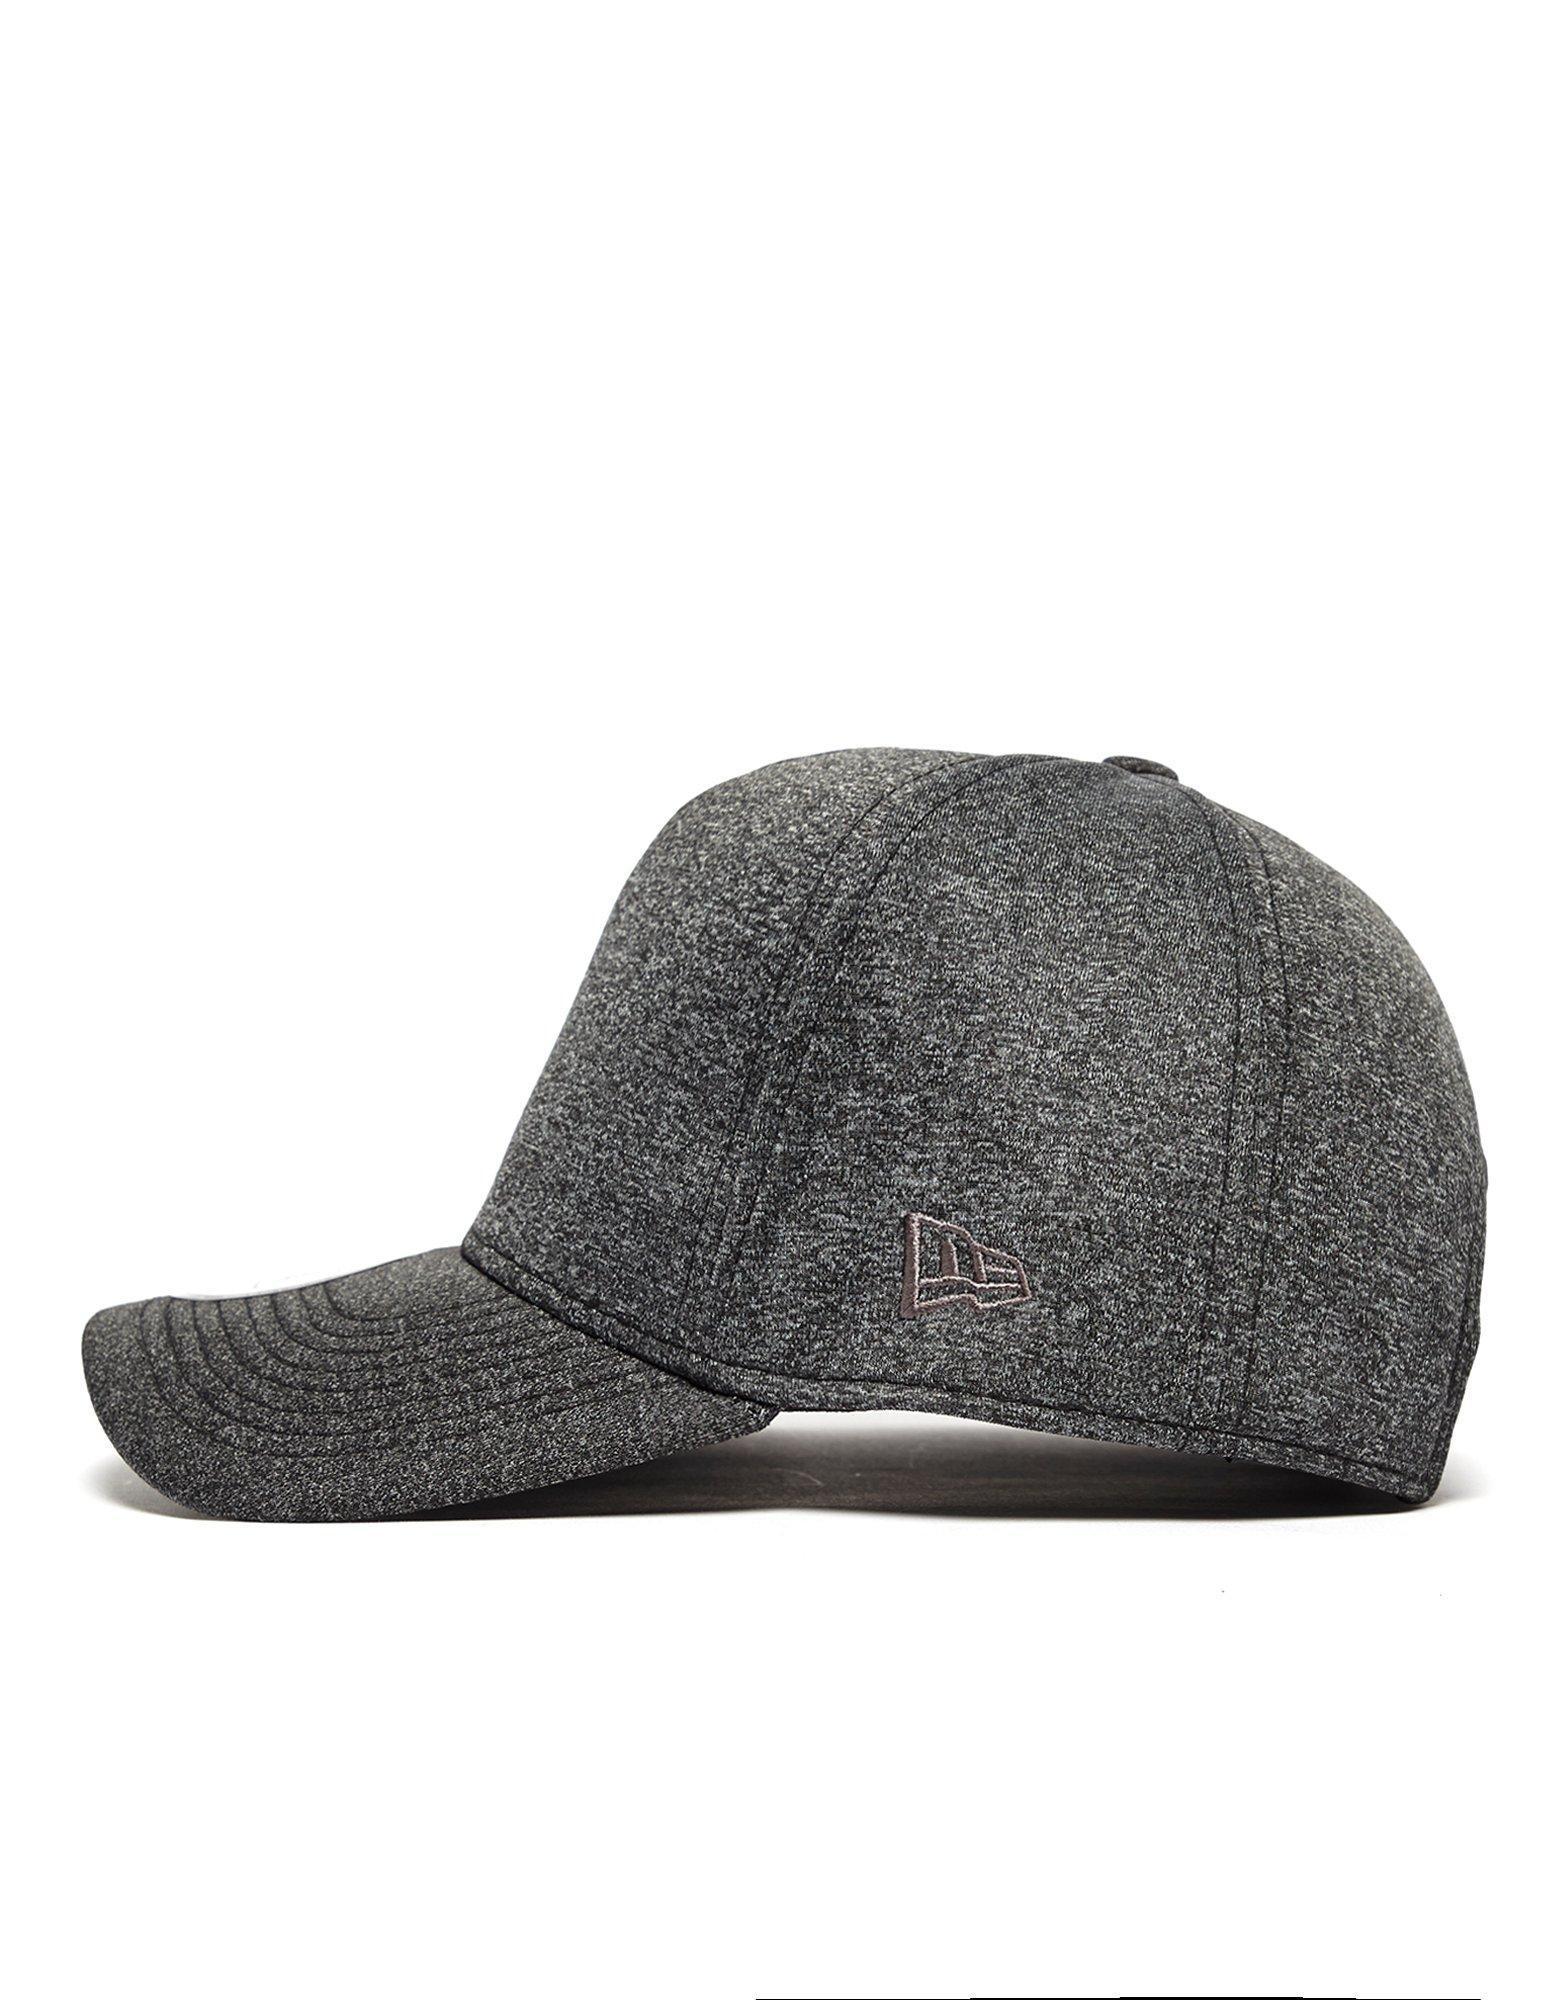 986b8bbd685 Lyst - KTZ A Frame Tech 9fifty Snapback Cap for Men